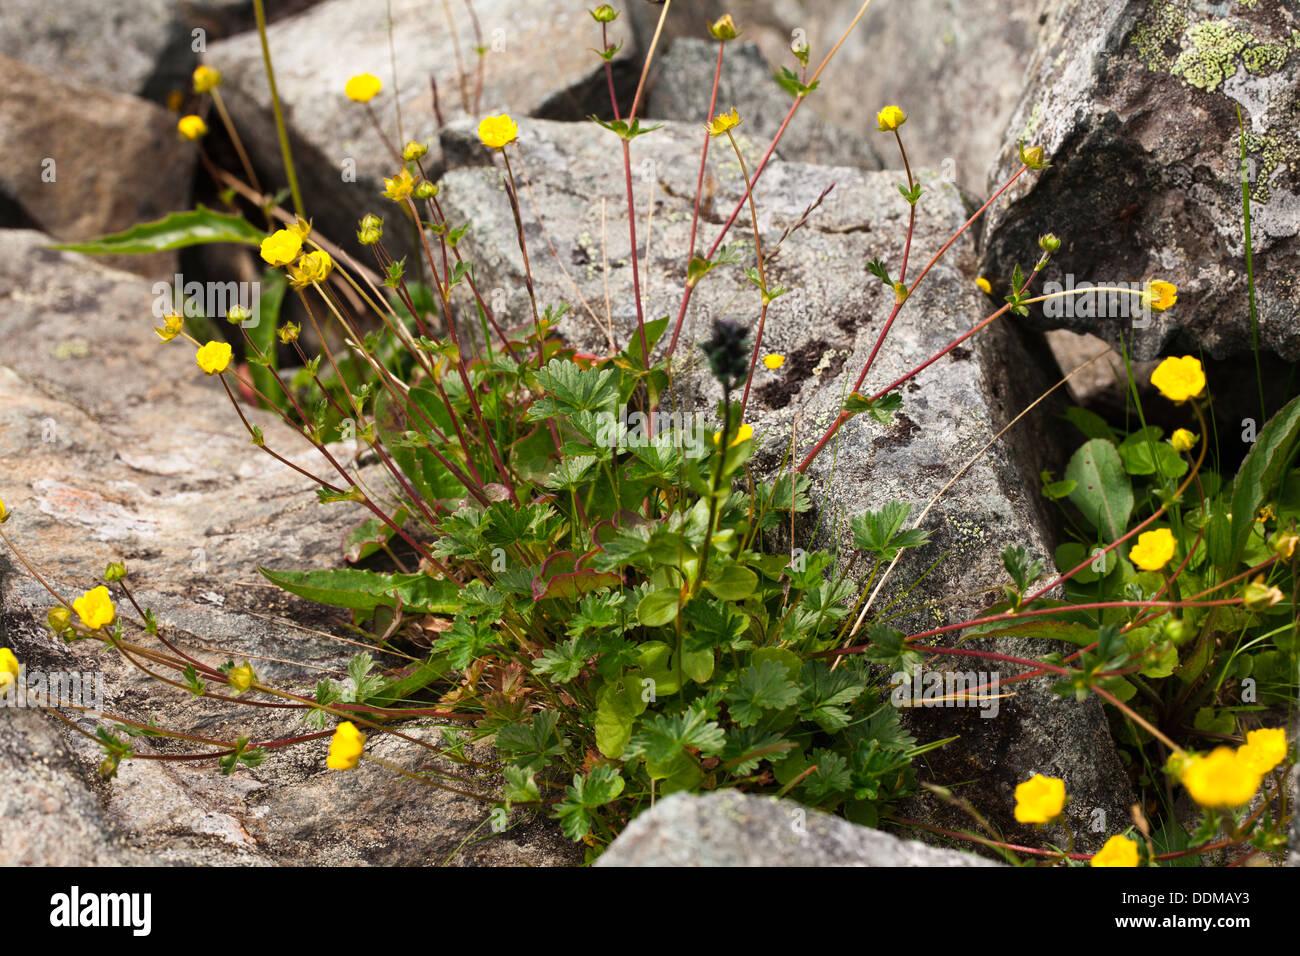 Snow cinquefoil (Potentilla nivea) flowers - Stock Image